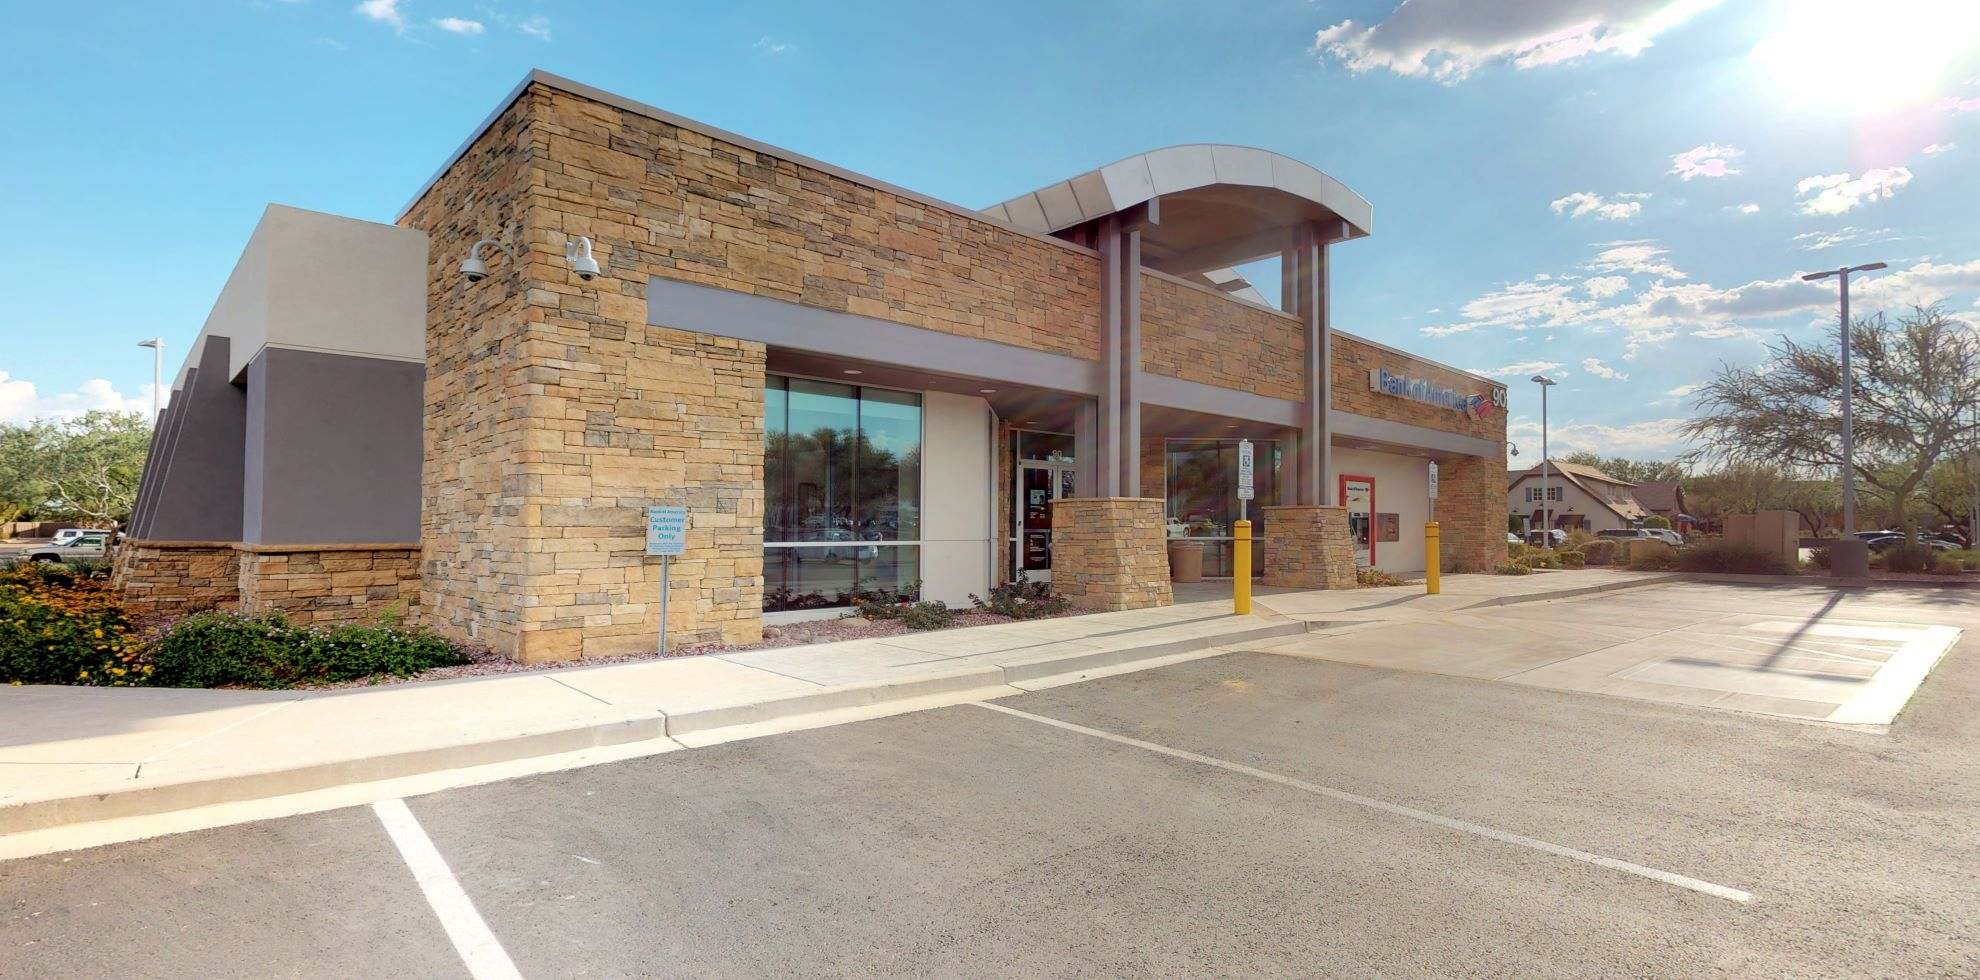 Bank of America financial center with drive-thru ATM | 21001 N Tatum Blvd STE 90, Phoenix, AZ 85050